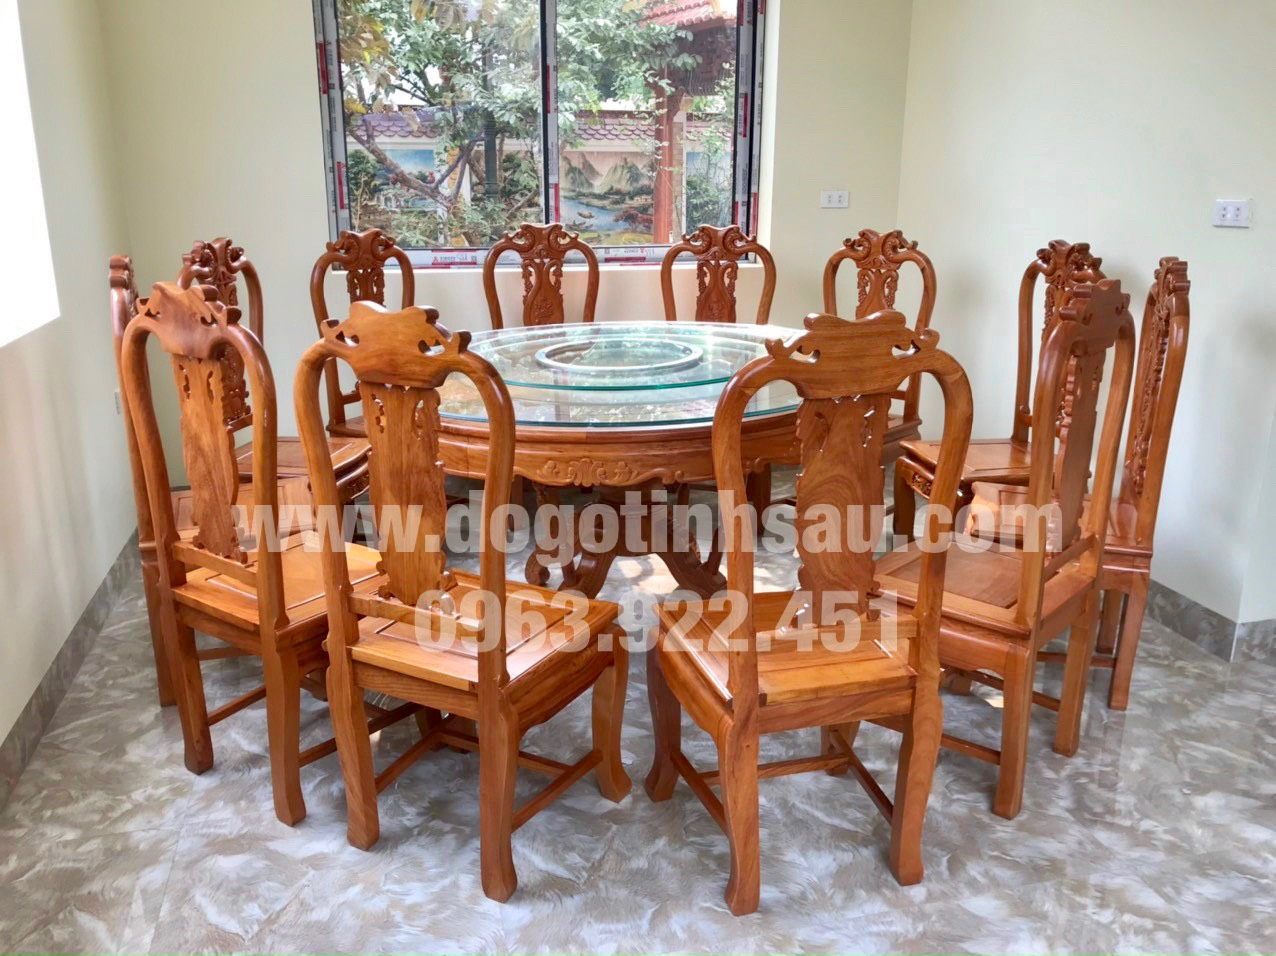 bo ban an 12 ghe go go do 1 - Bộ ghế ăn gỗ gõ đỏ bàn tròn xoay 360 (12 ghế)